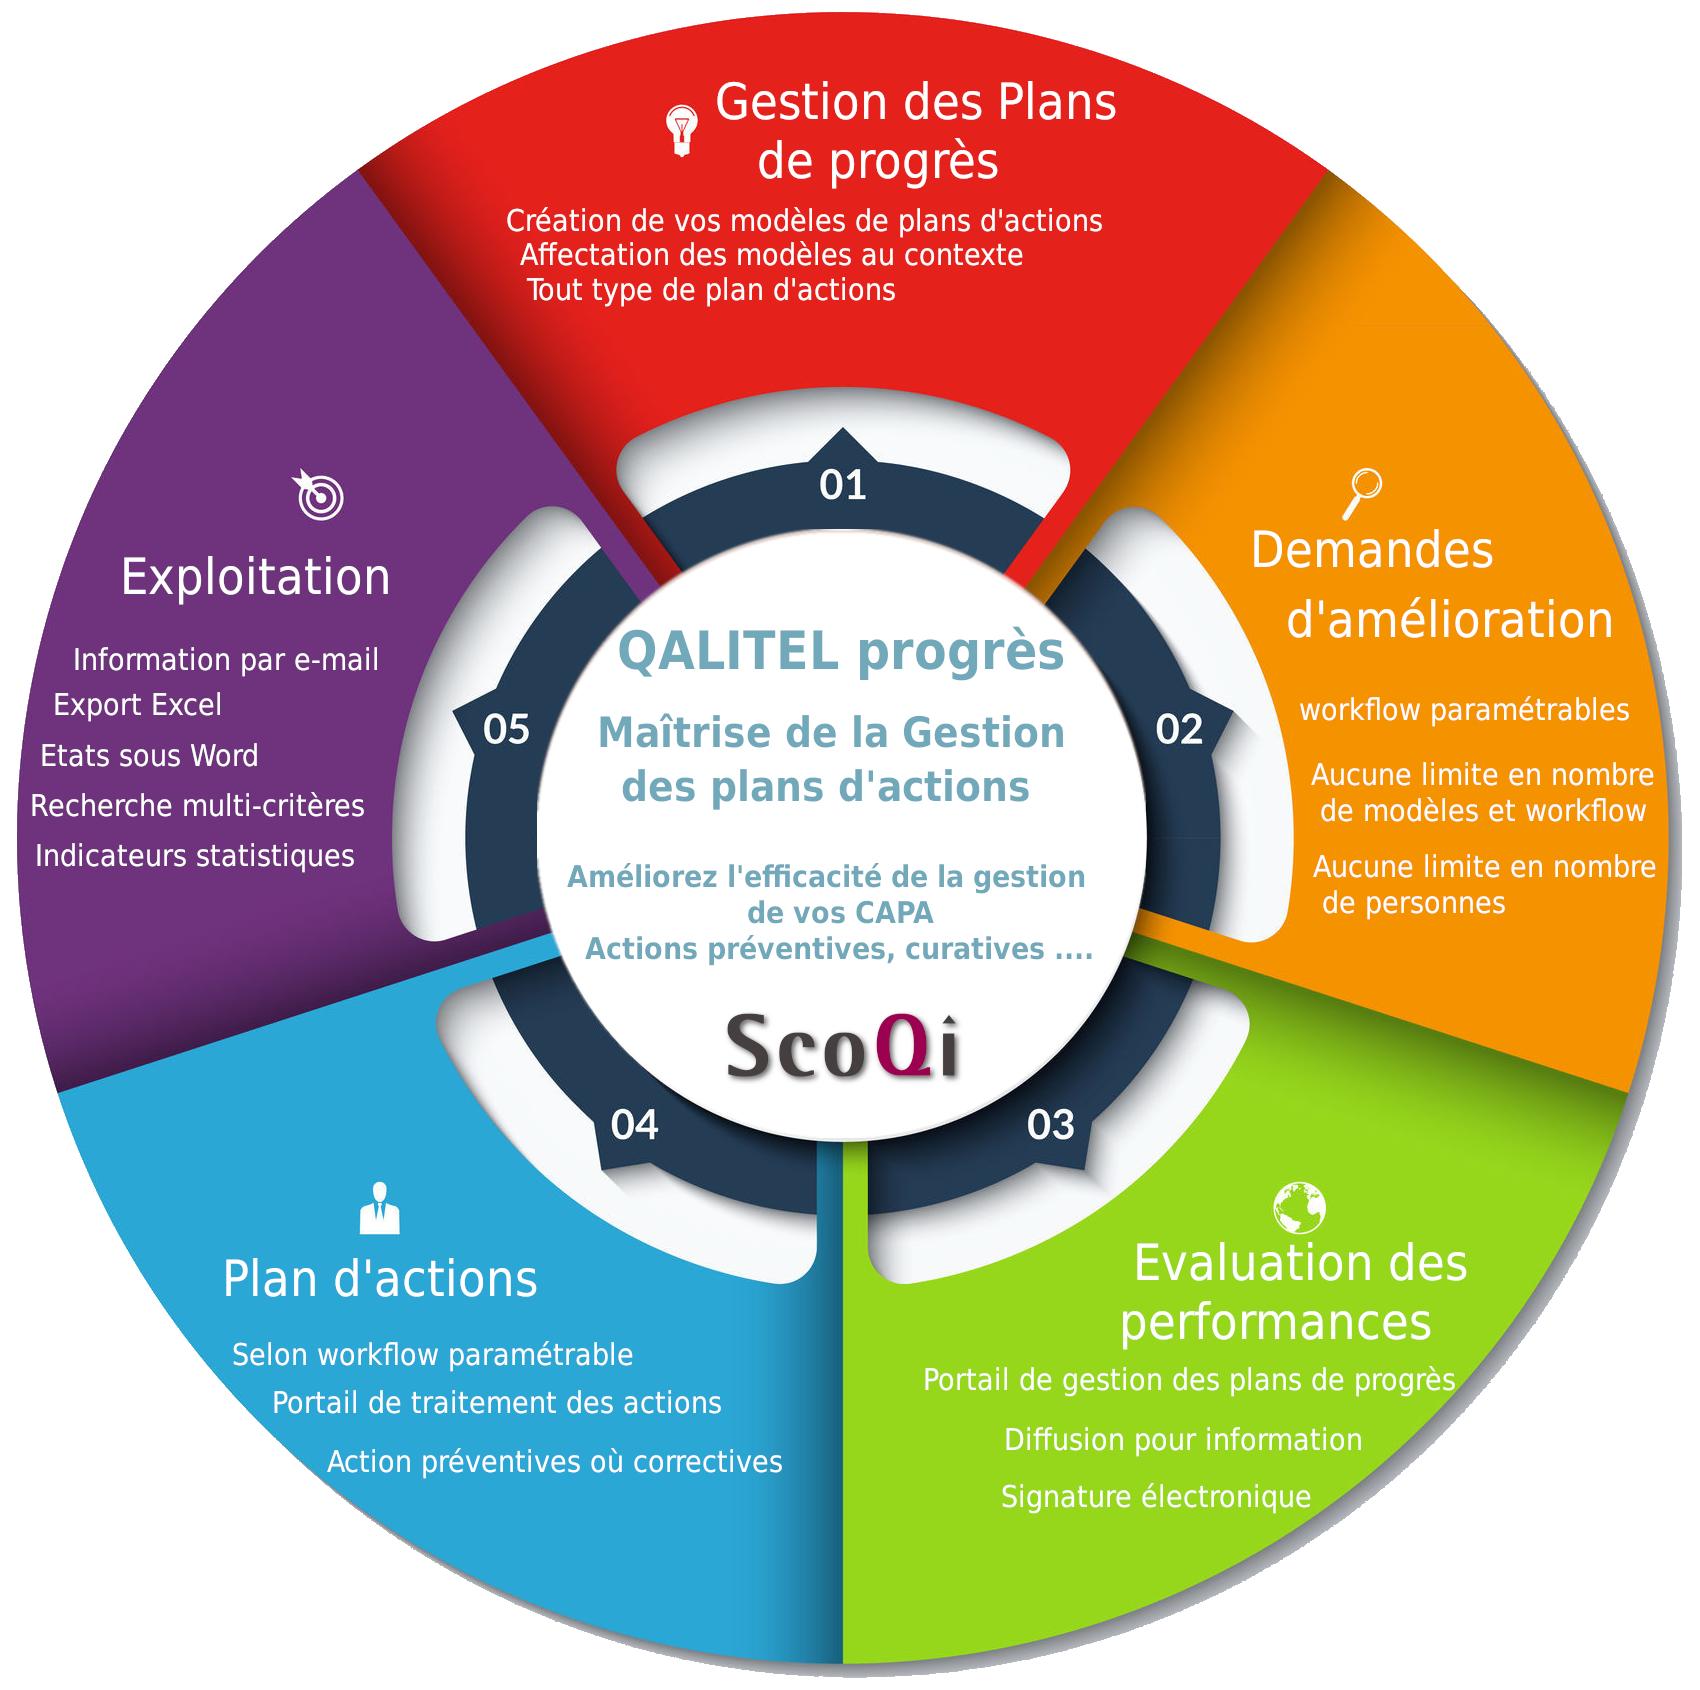 Logo-scoqi-logiciel-qualite-produit-logiciels - logo-logiciel_gestion_plan-actions-scoqi-qalitel-progres